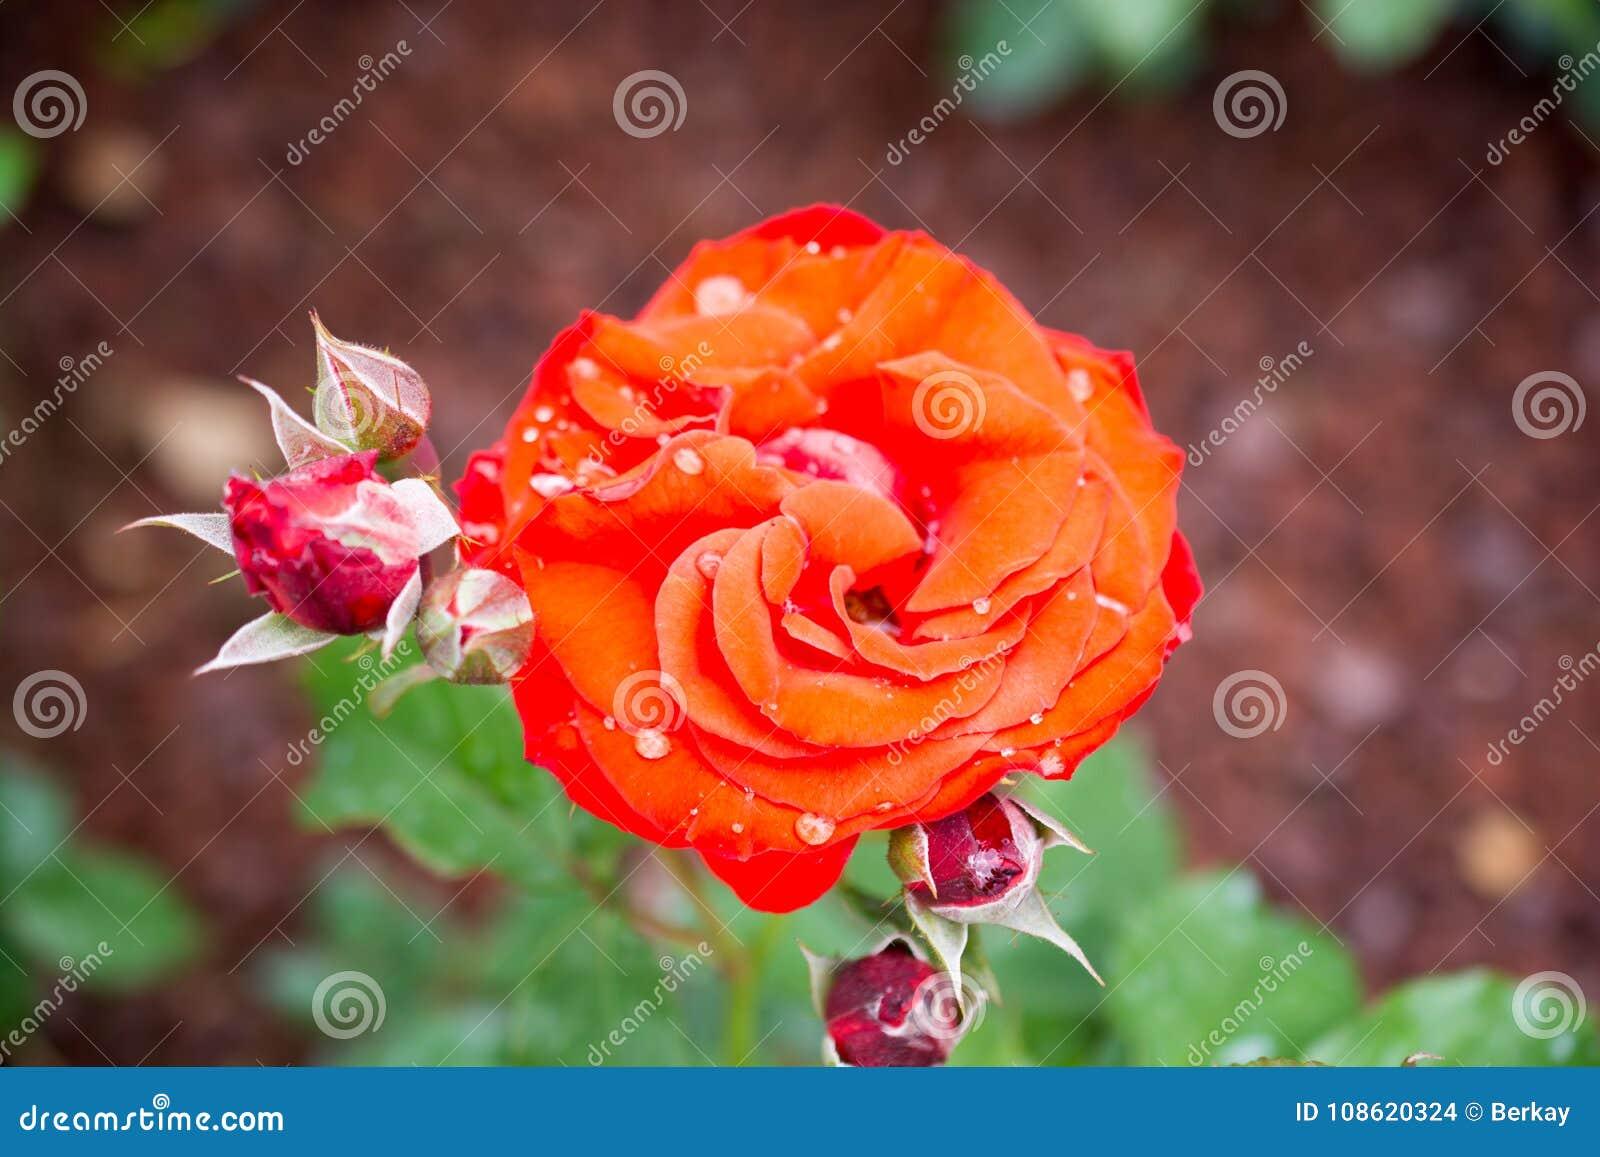 Beautiful Colorful Rose Flower Stock Photo Image Of Nature Single